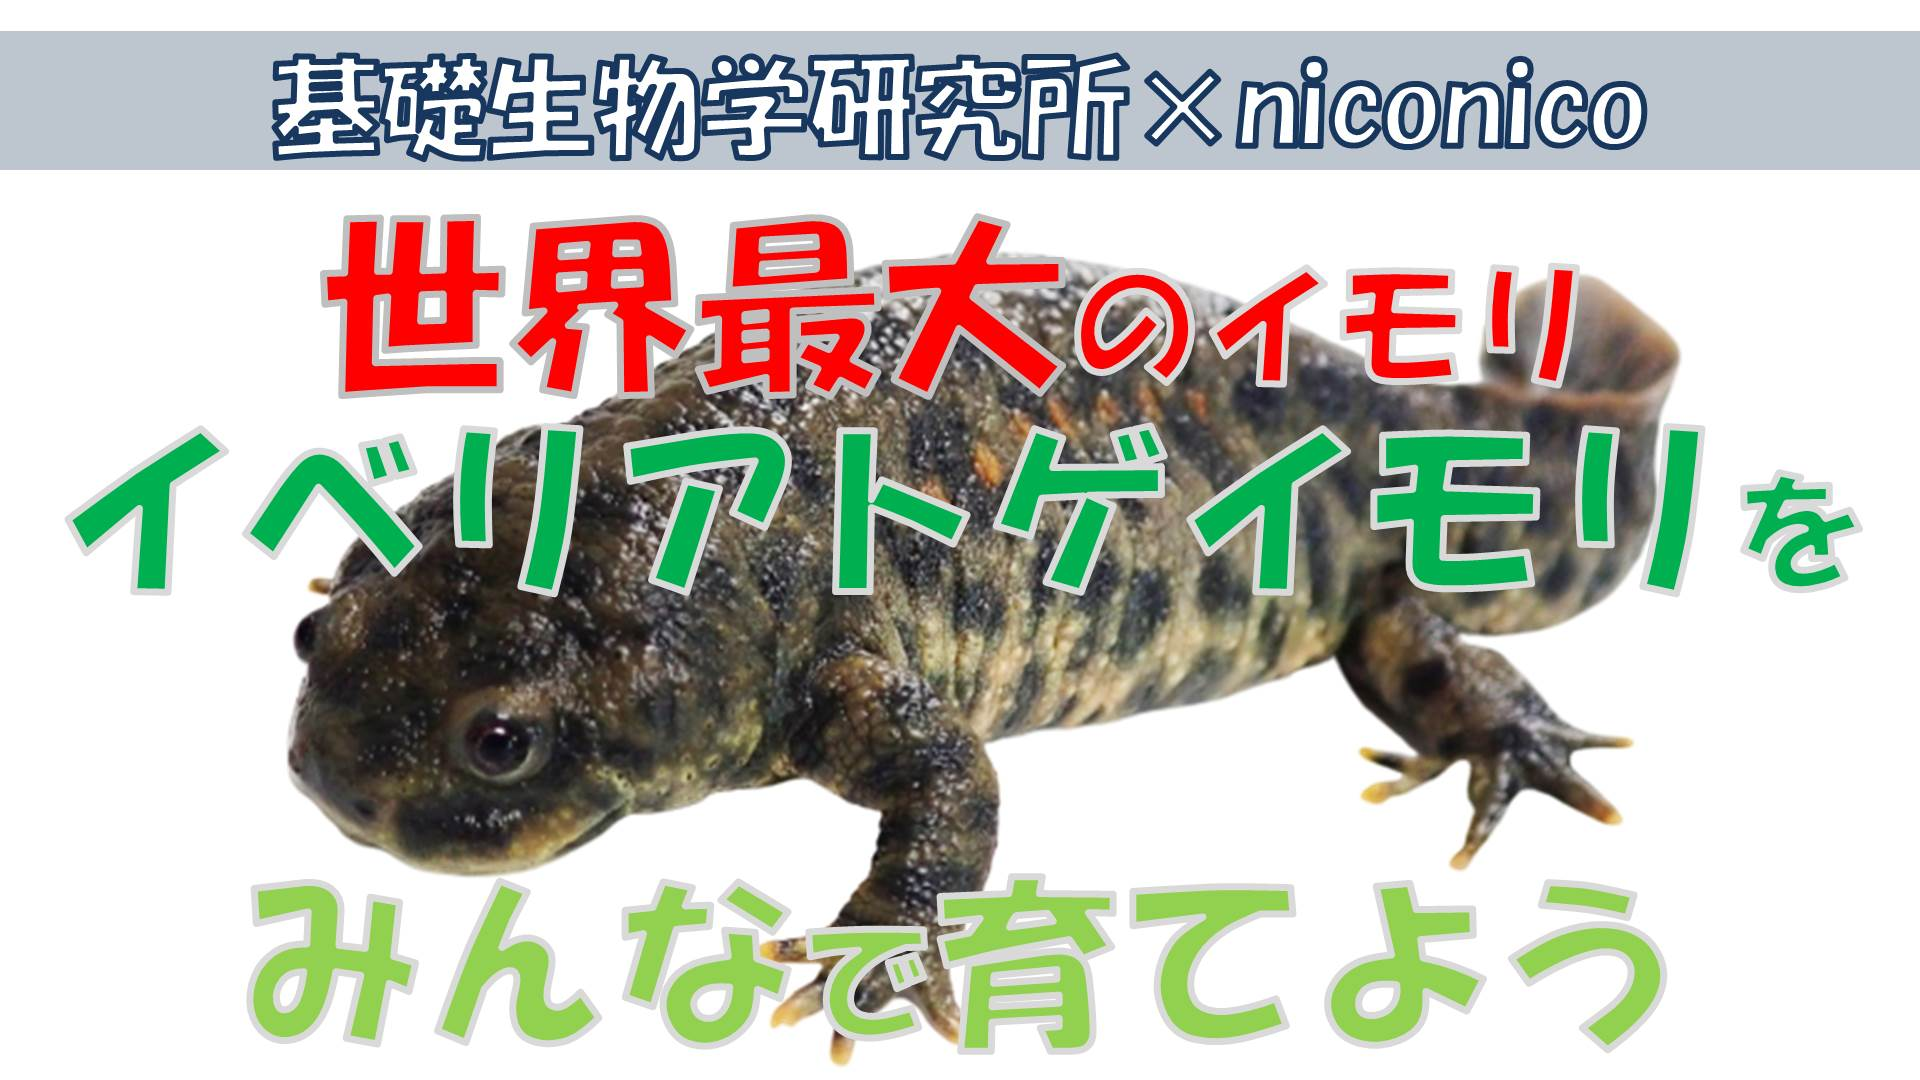 imori_niconico.jpg